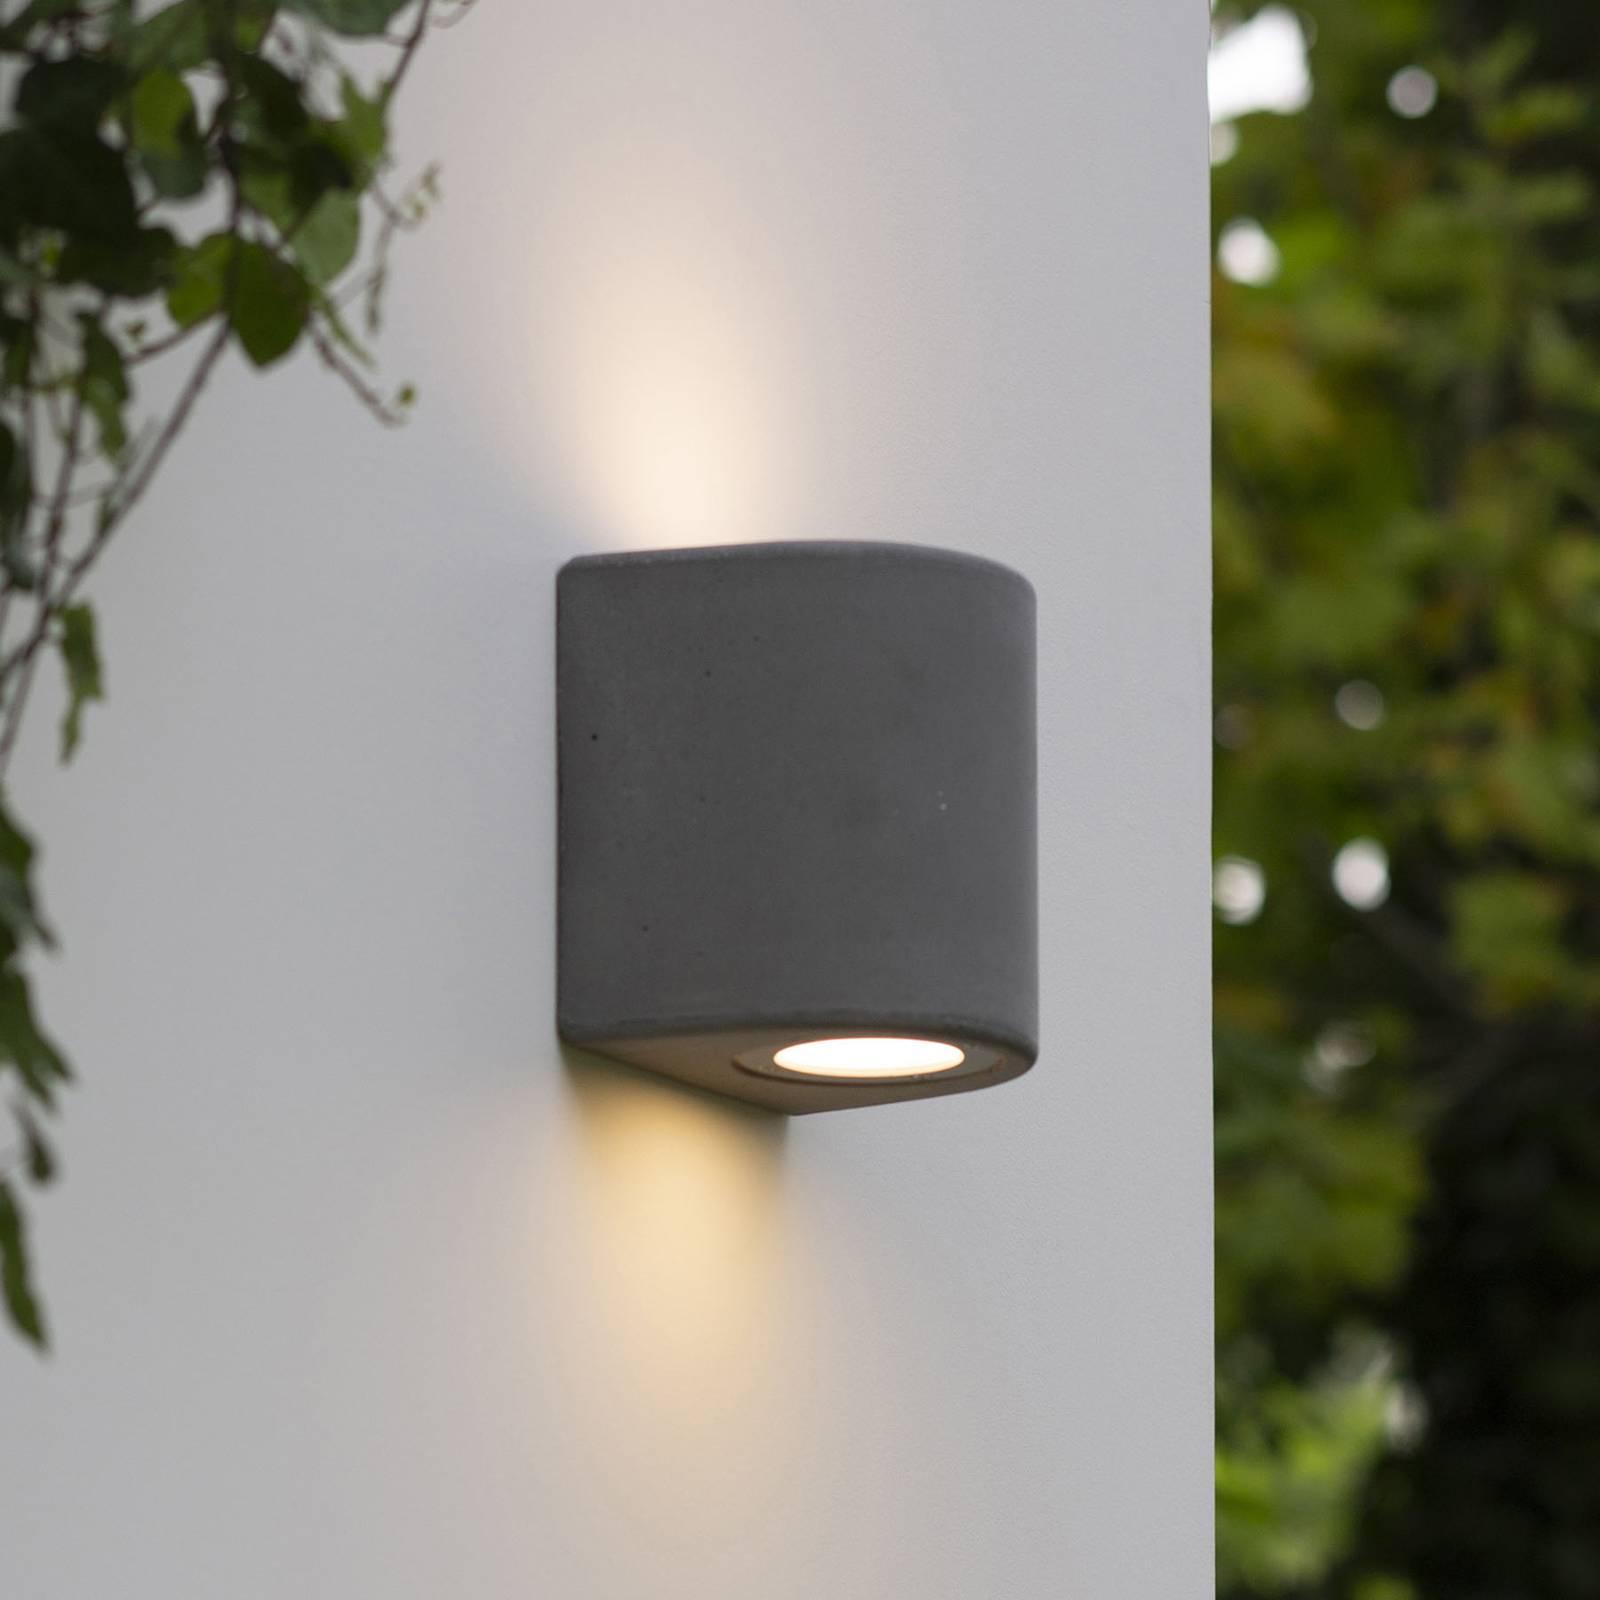 Martinelli Luce Koala LED buitenwandlamp up/down